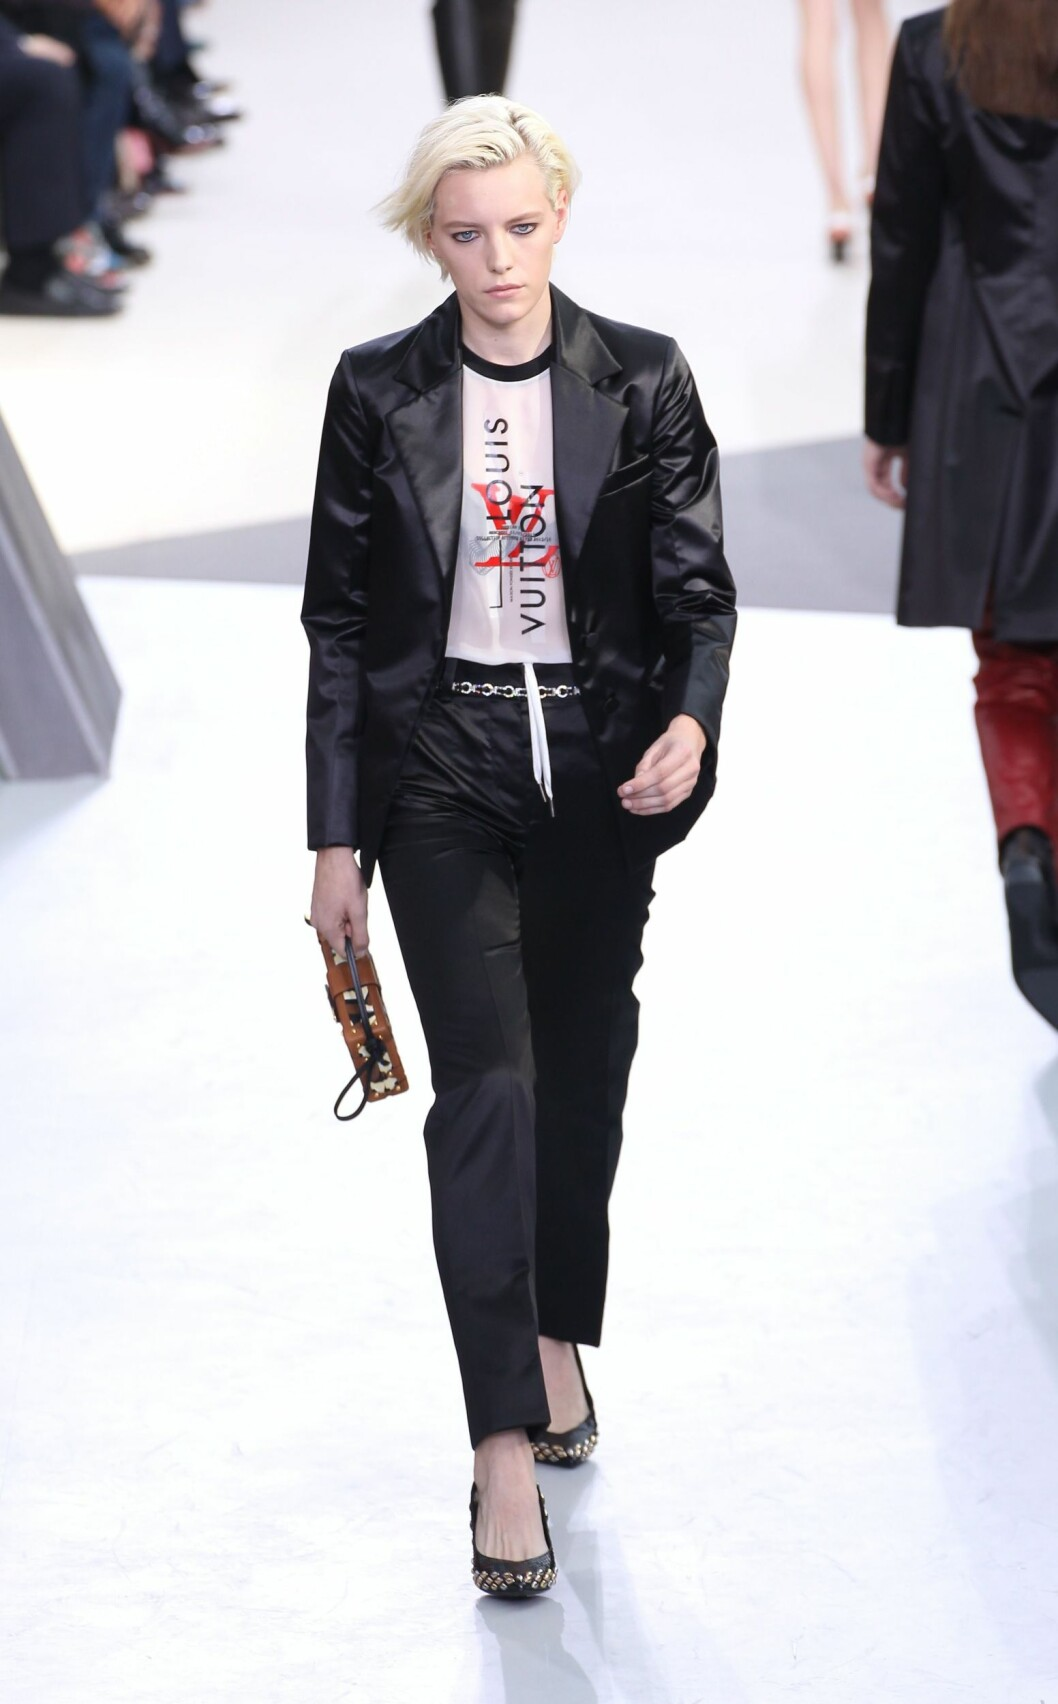 Louis Vuitton høst/vinter 2015/2016. Foto: REX/All Over Press